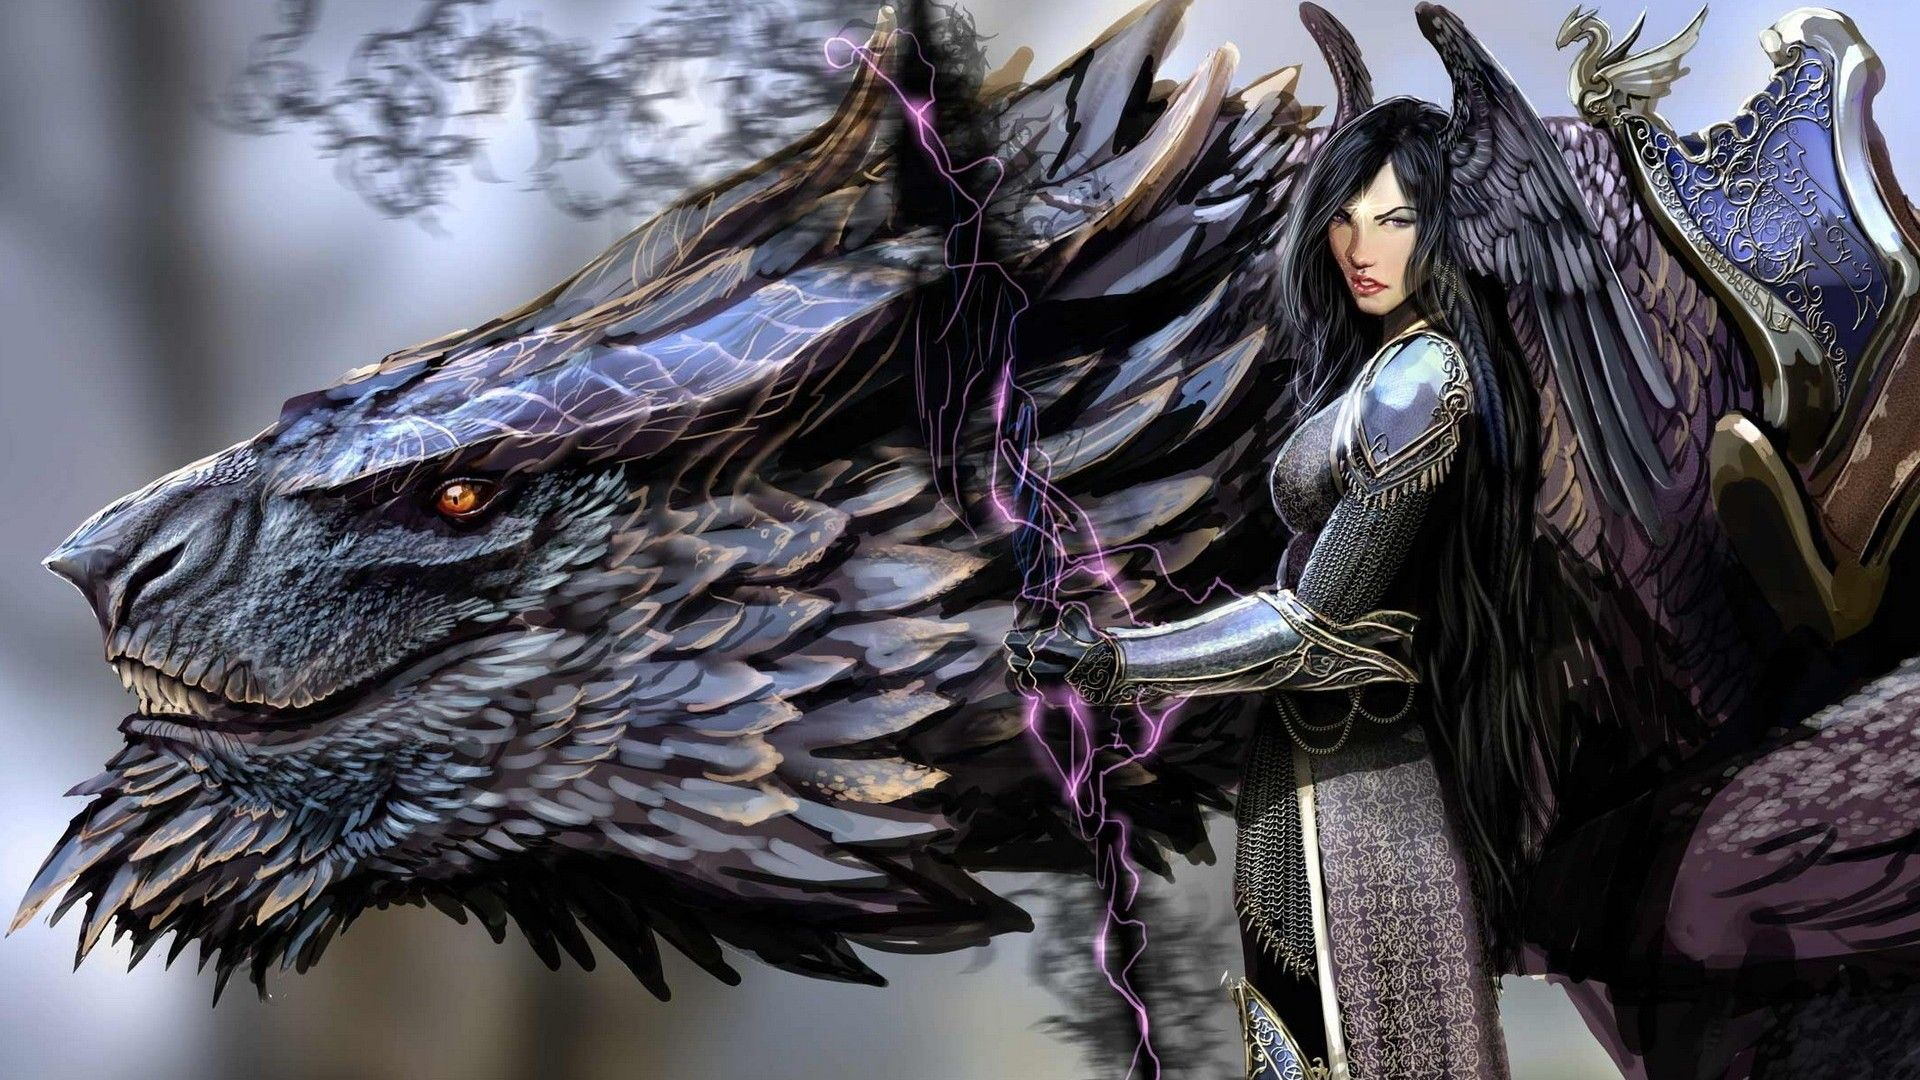 Black Dragon Wallpaper Widescreen Hd Wallpapers Dragón